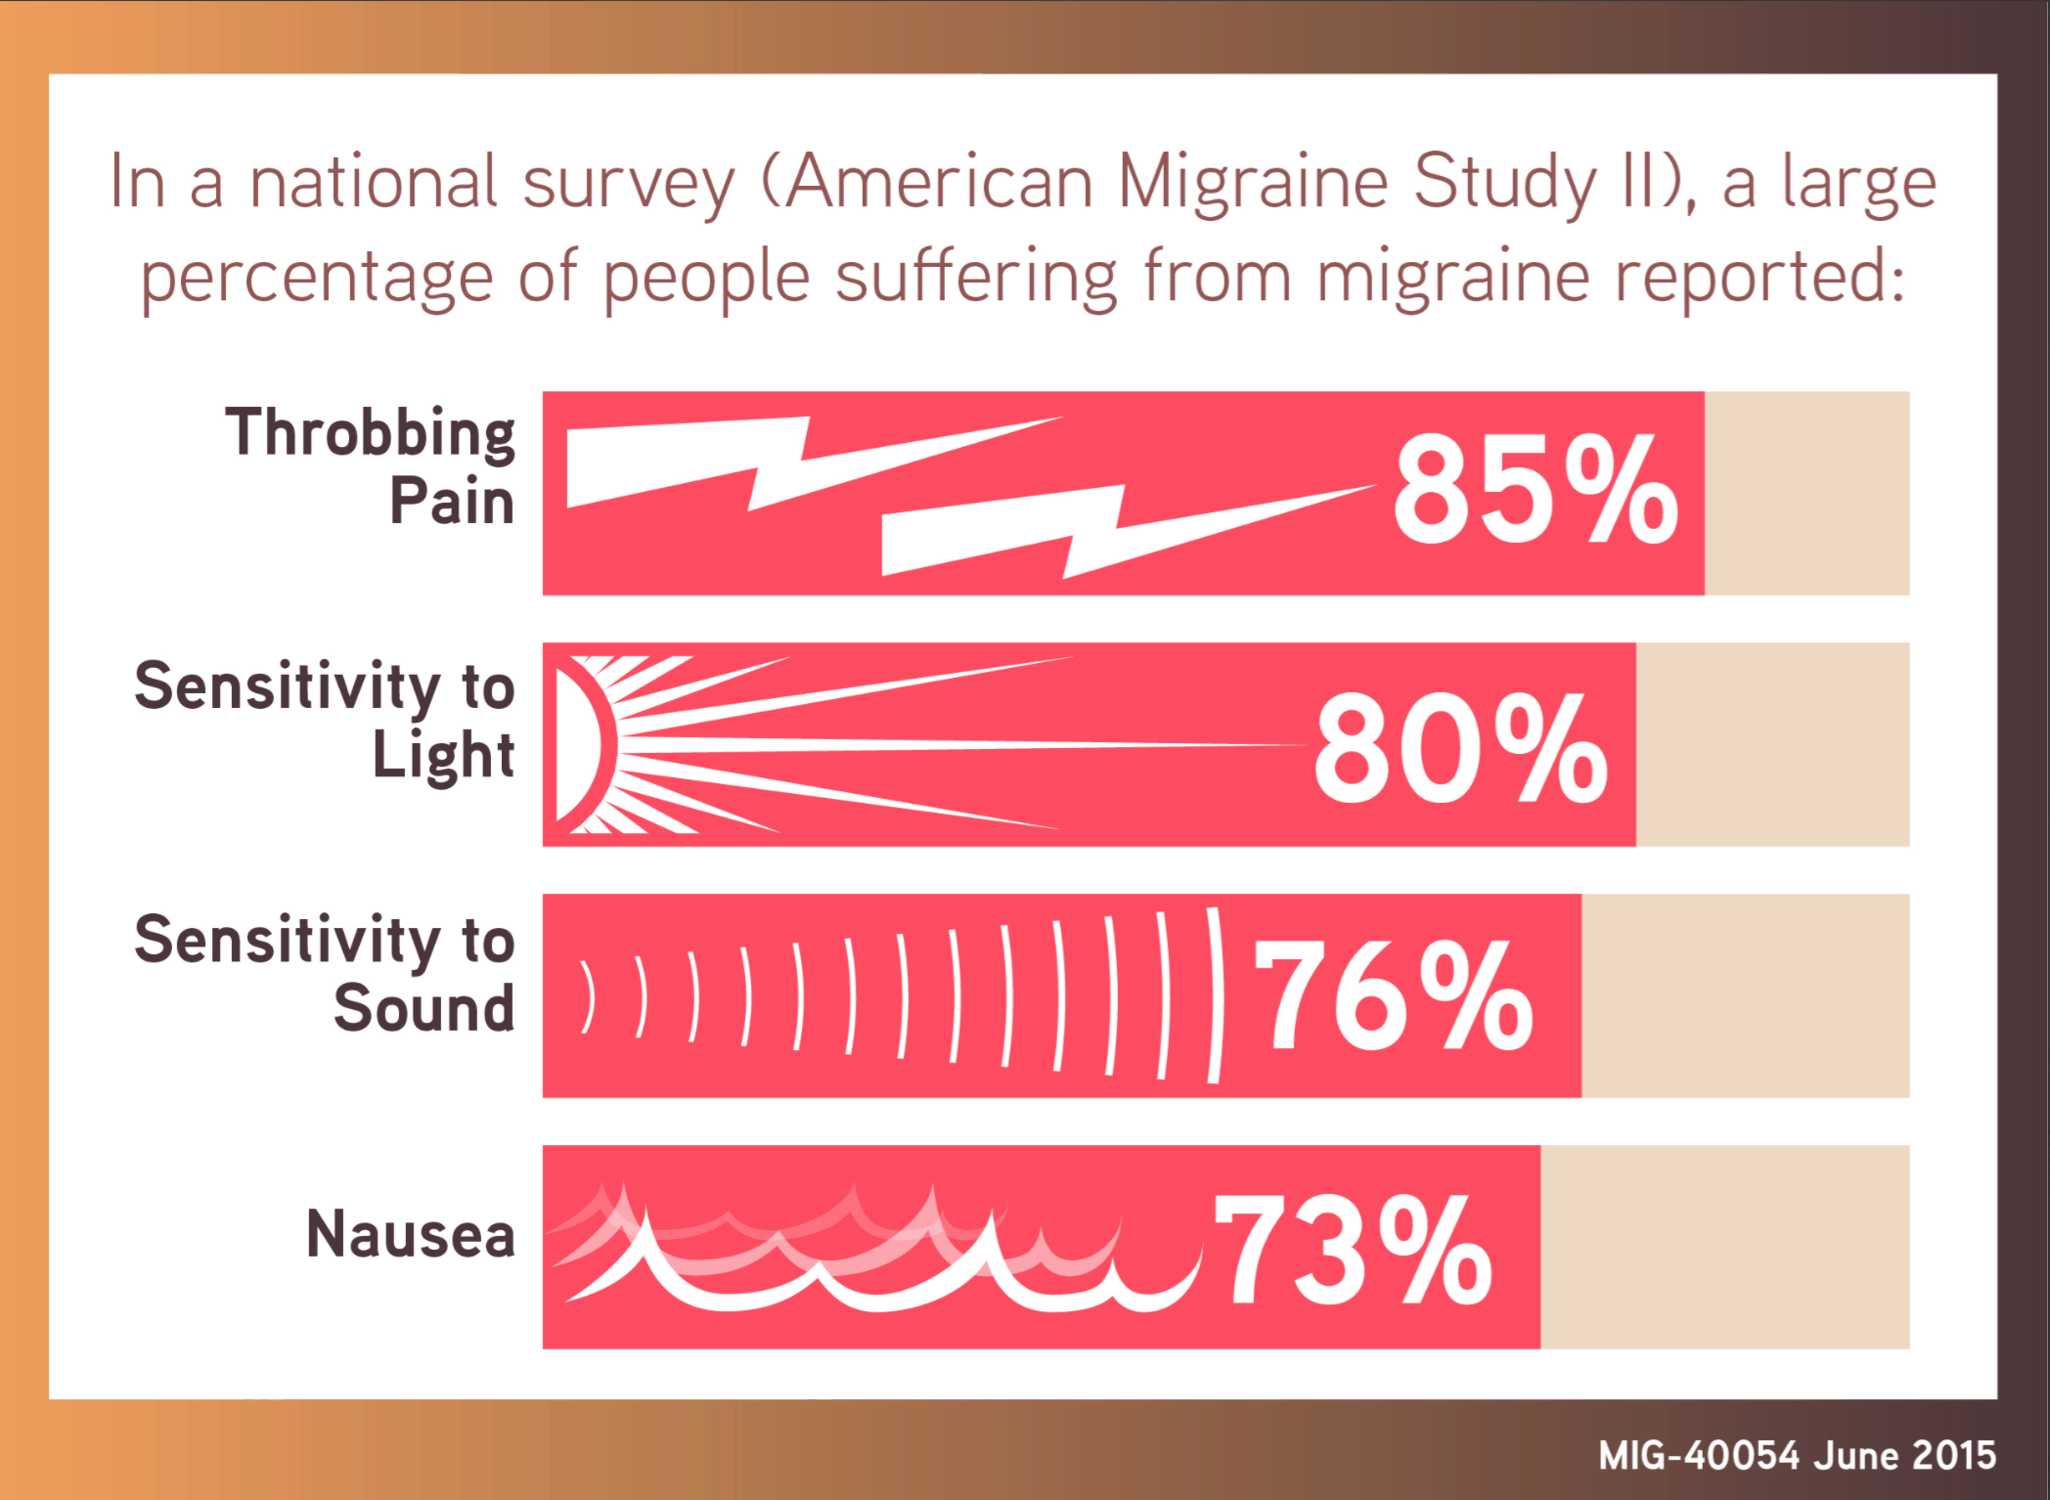 migraine infographic - national survey